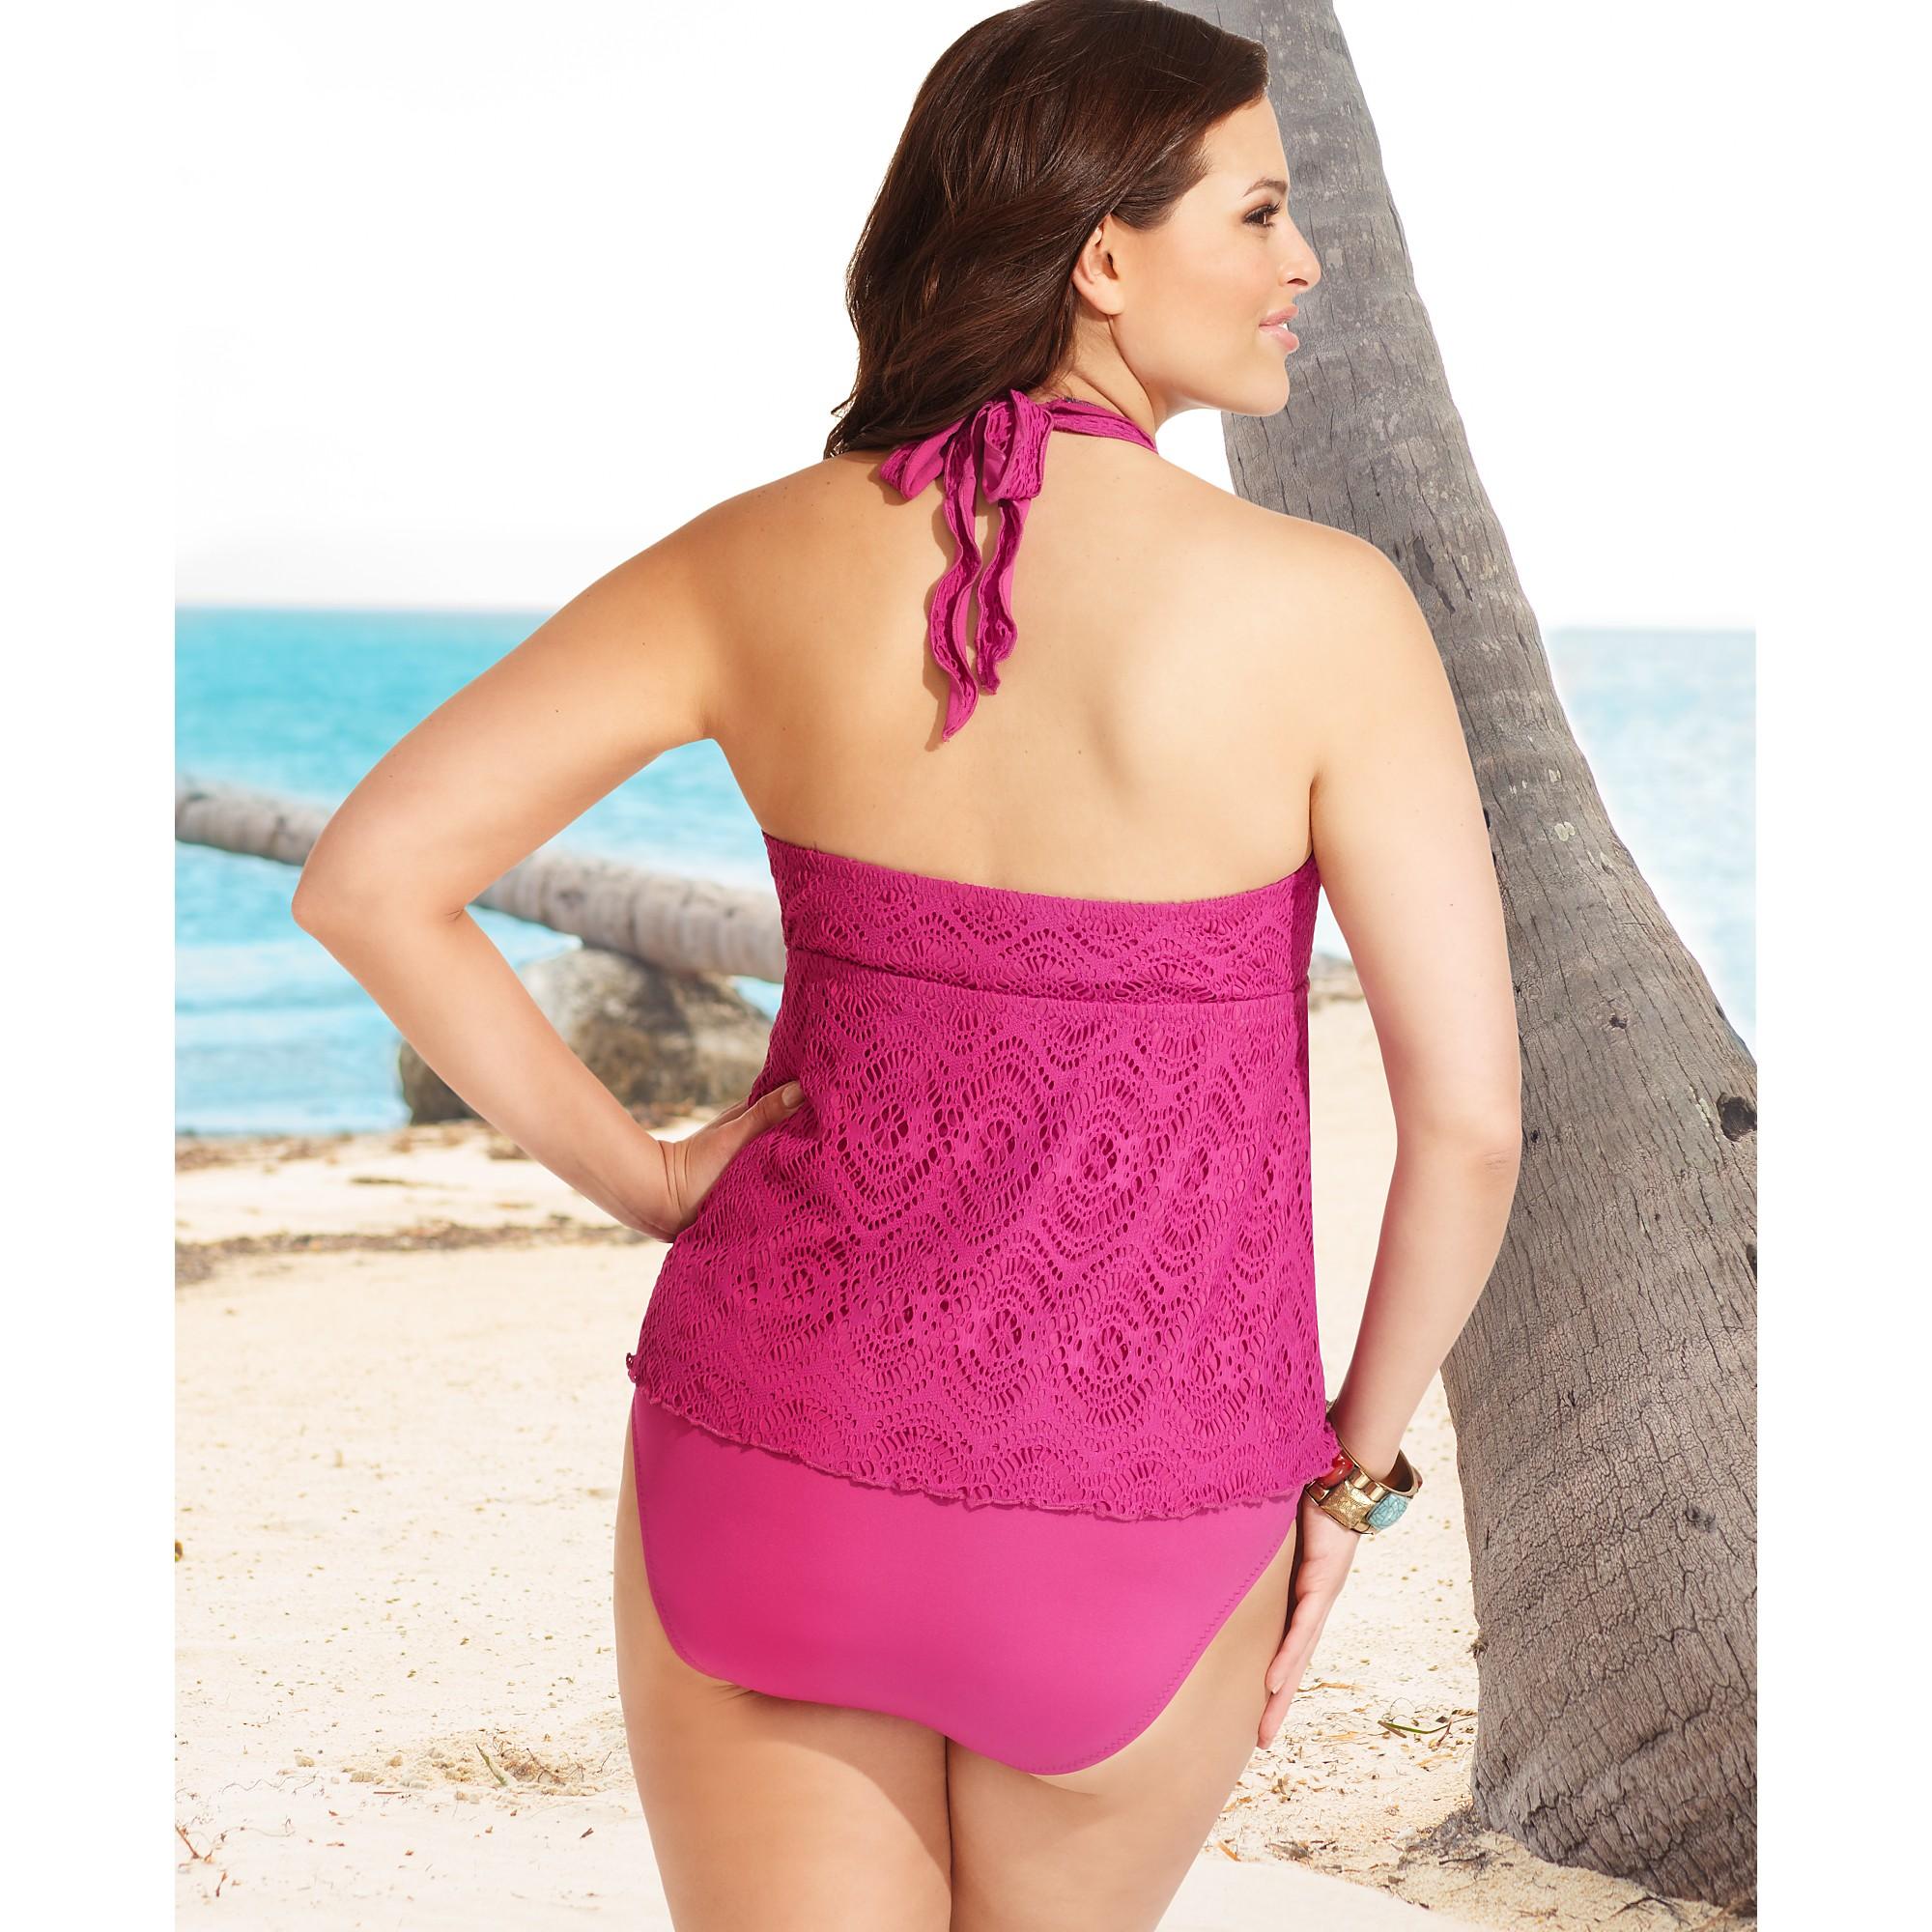 b369c74705 Becca Halter Crochet Tankini Top in Pink - Lyst